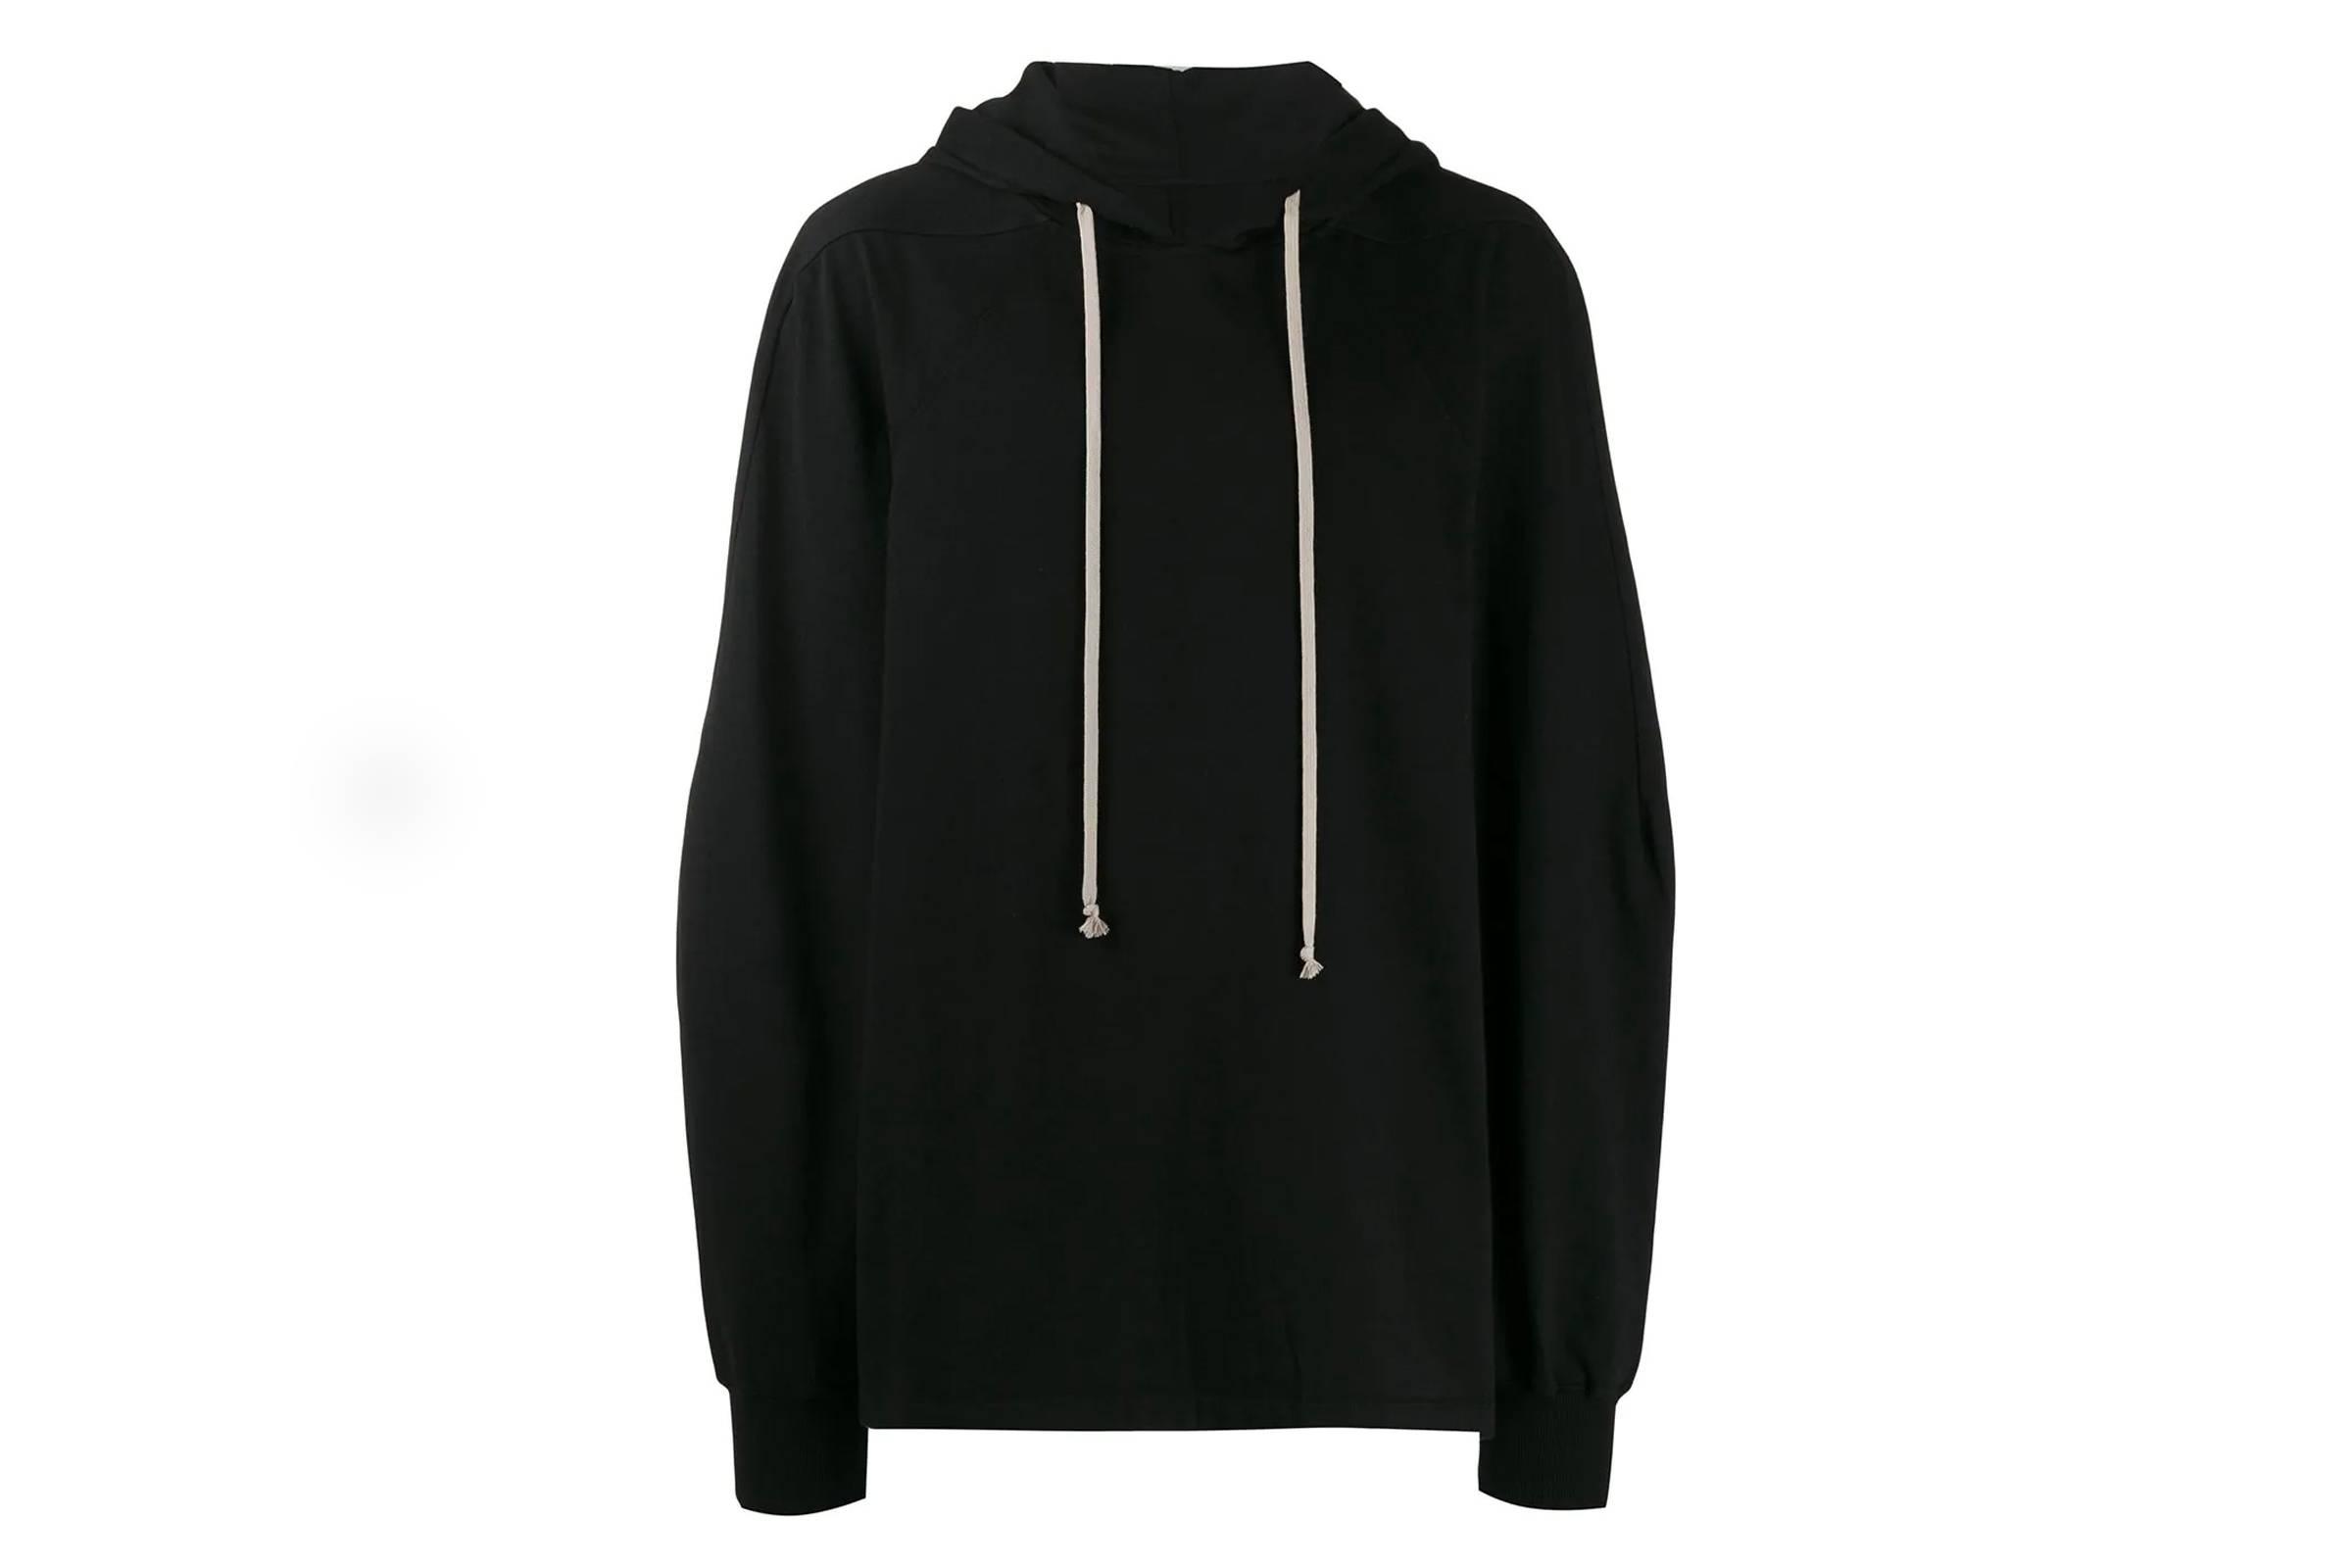 5. Rick Owens DRKSHDW Sweatshirt